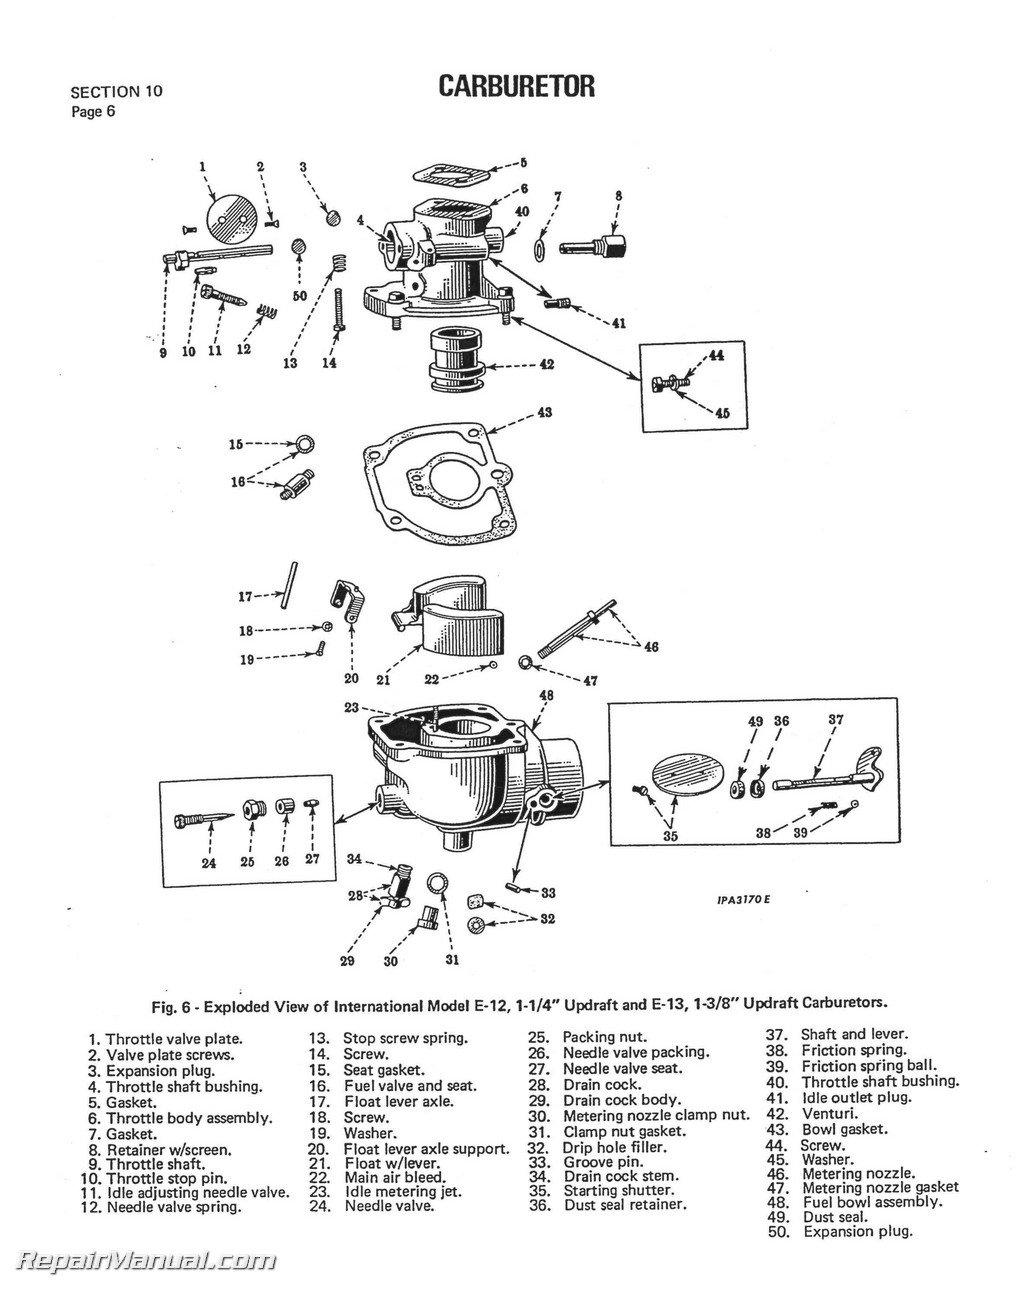 ih-s-super-c international harvester farmall tractor engine clutch  transmission service manual: by author: amazon.com: books  amazon.com